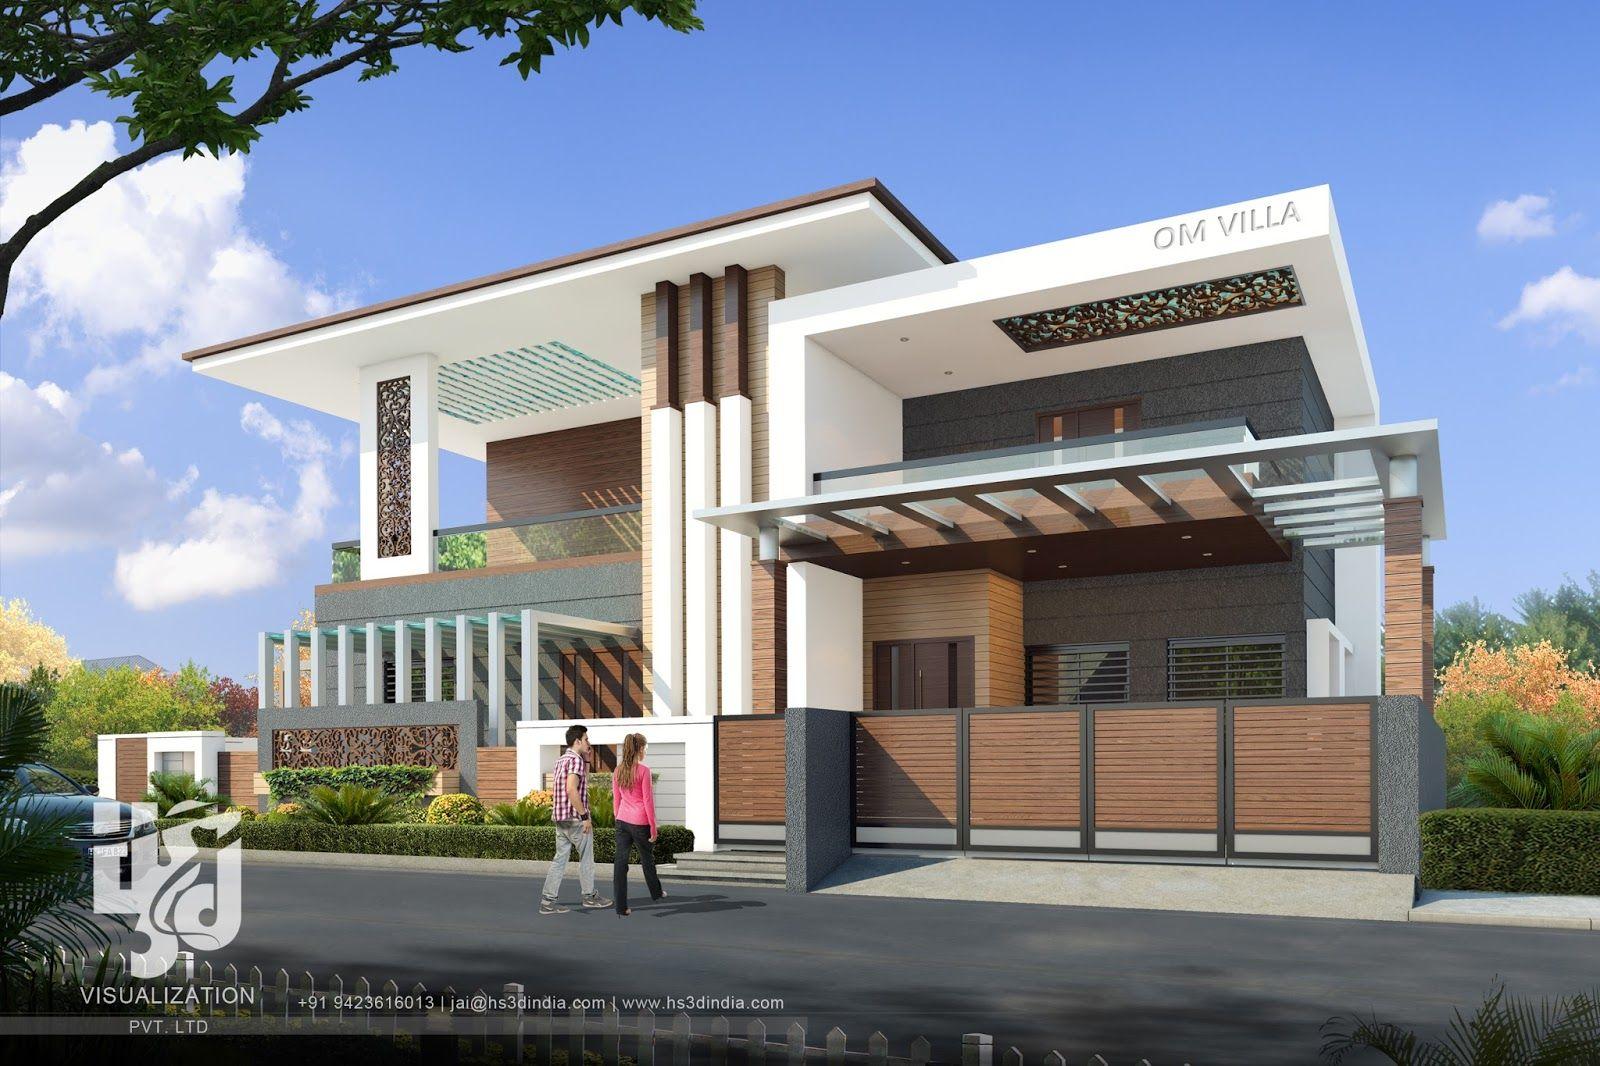 Exterior 1 28102 29 Jpg 1600 1066 House Outside Design Exterior Design House Front Design